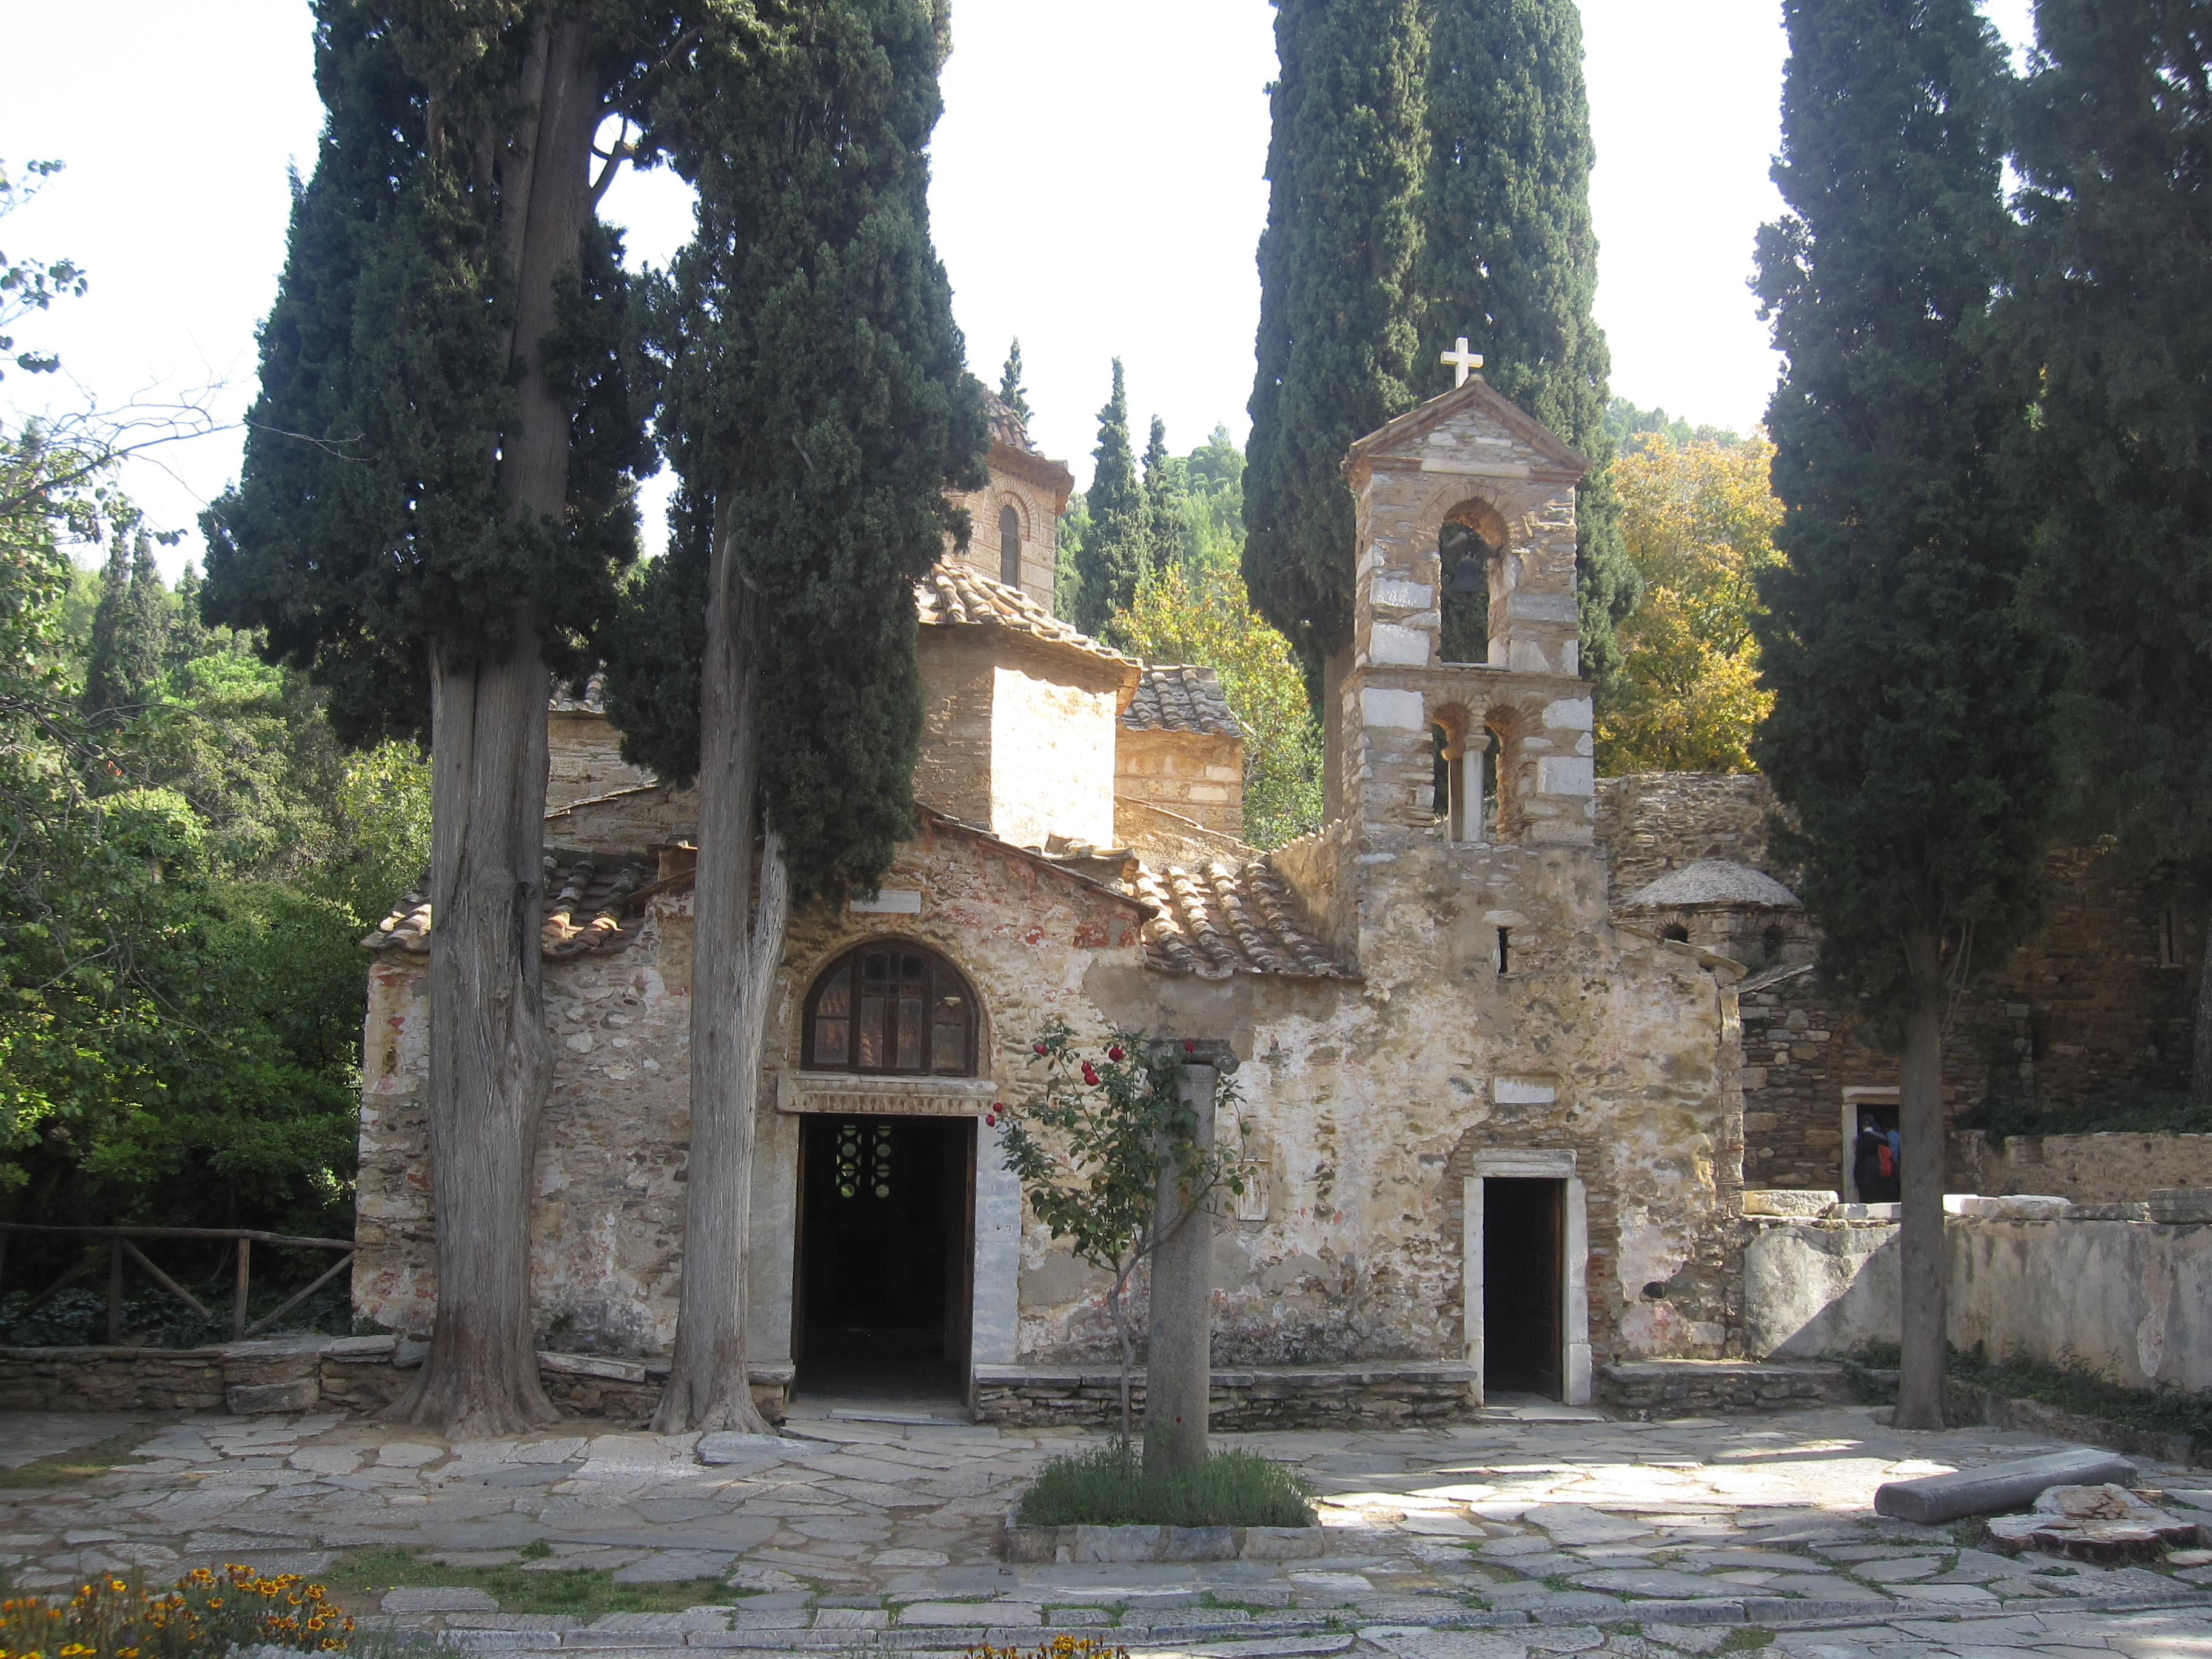 My travels to Greece in 2014 – part 2  britisharmysgtmonkey